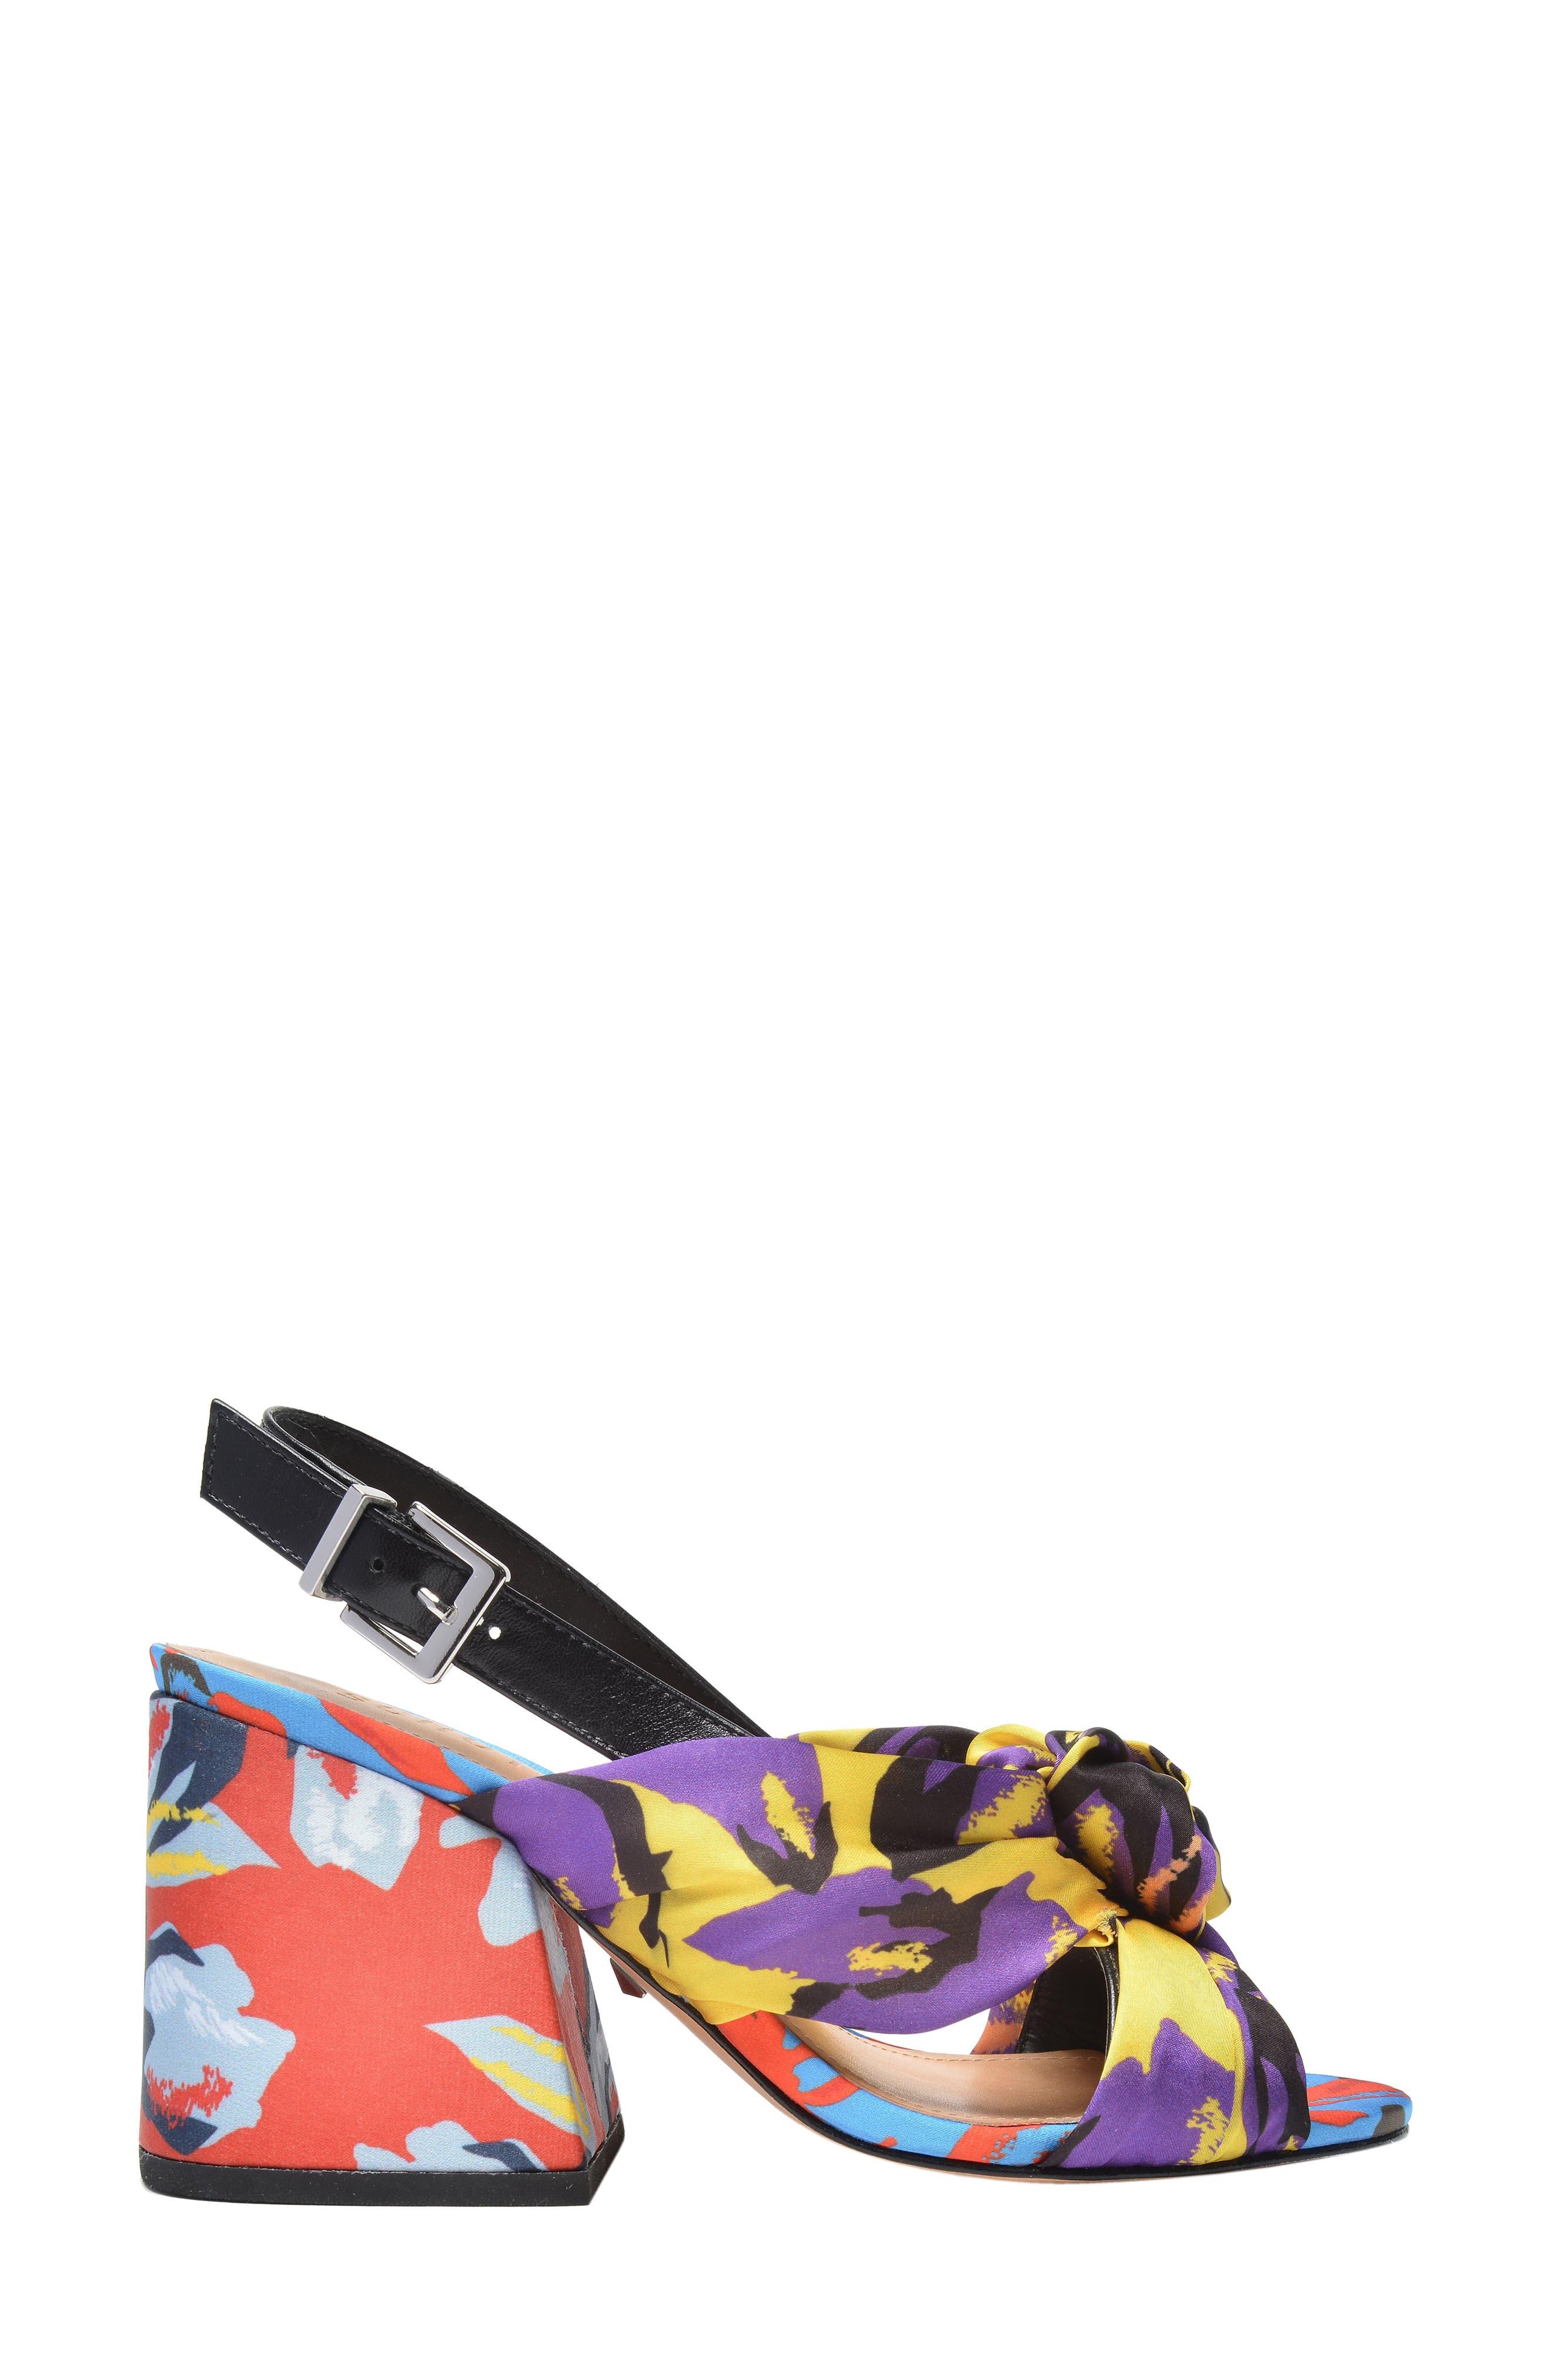 x Adriana Lima Sandal,                             Alternate thumbnail 3, color,                             Floral Print Fabric